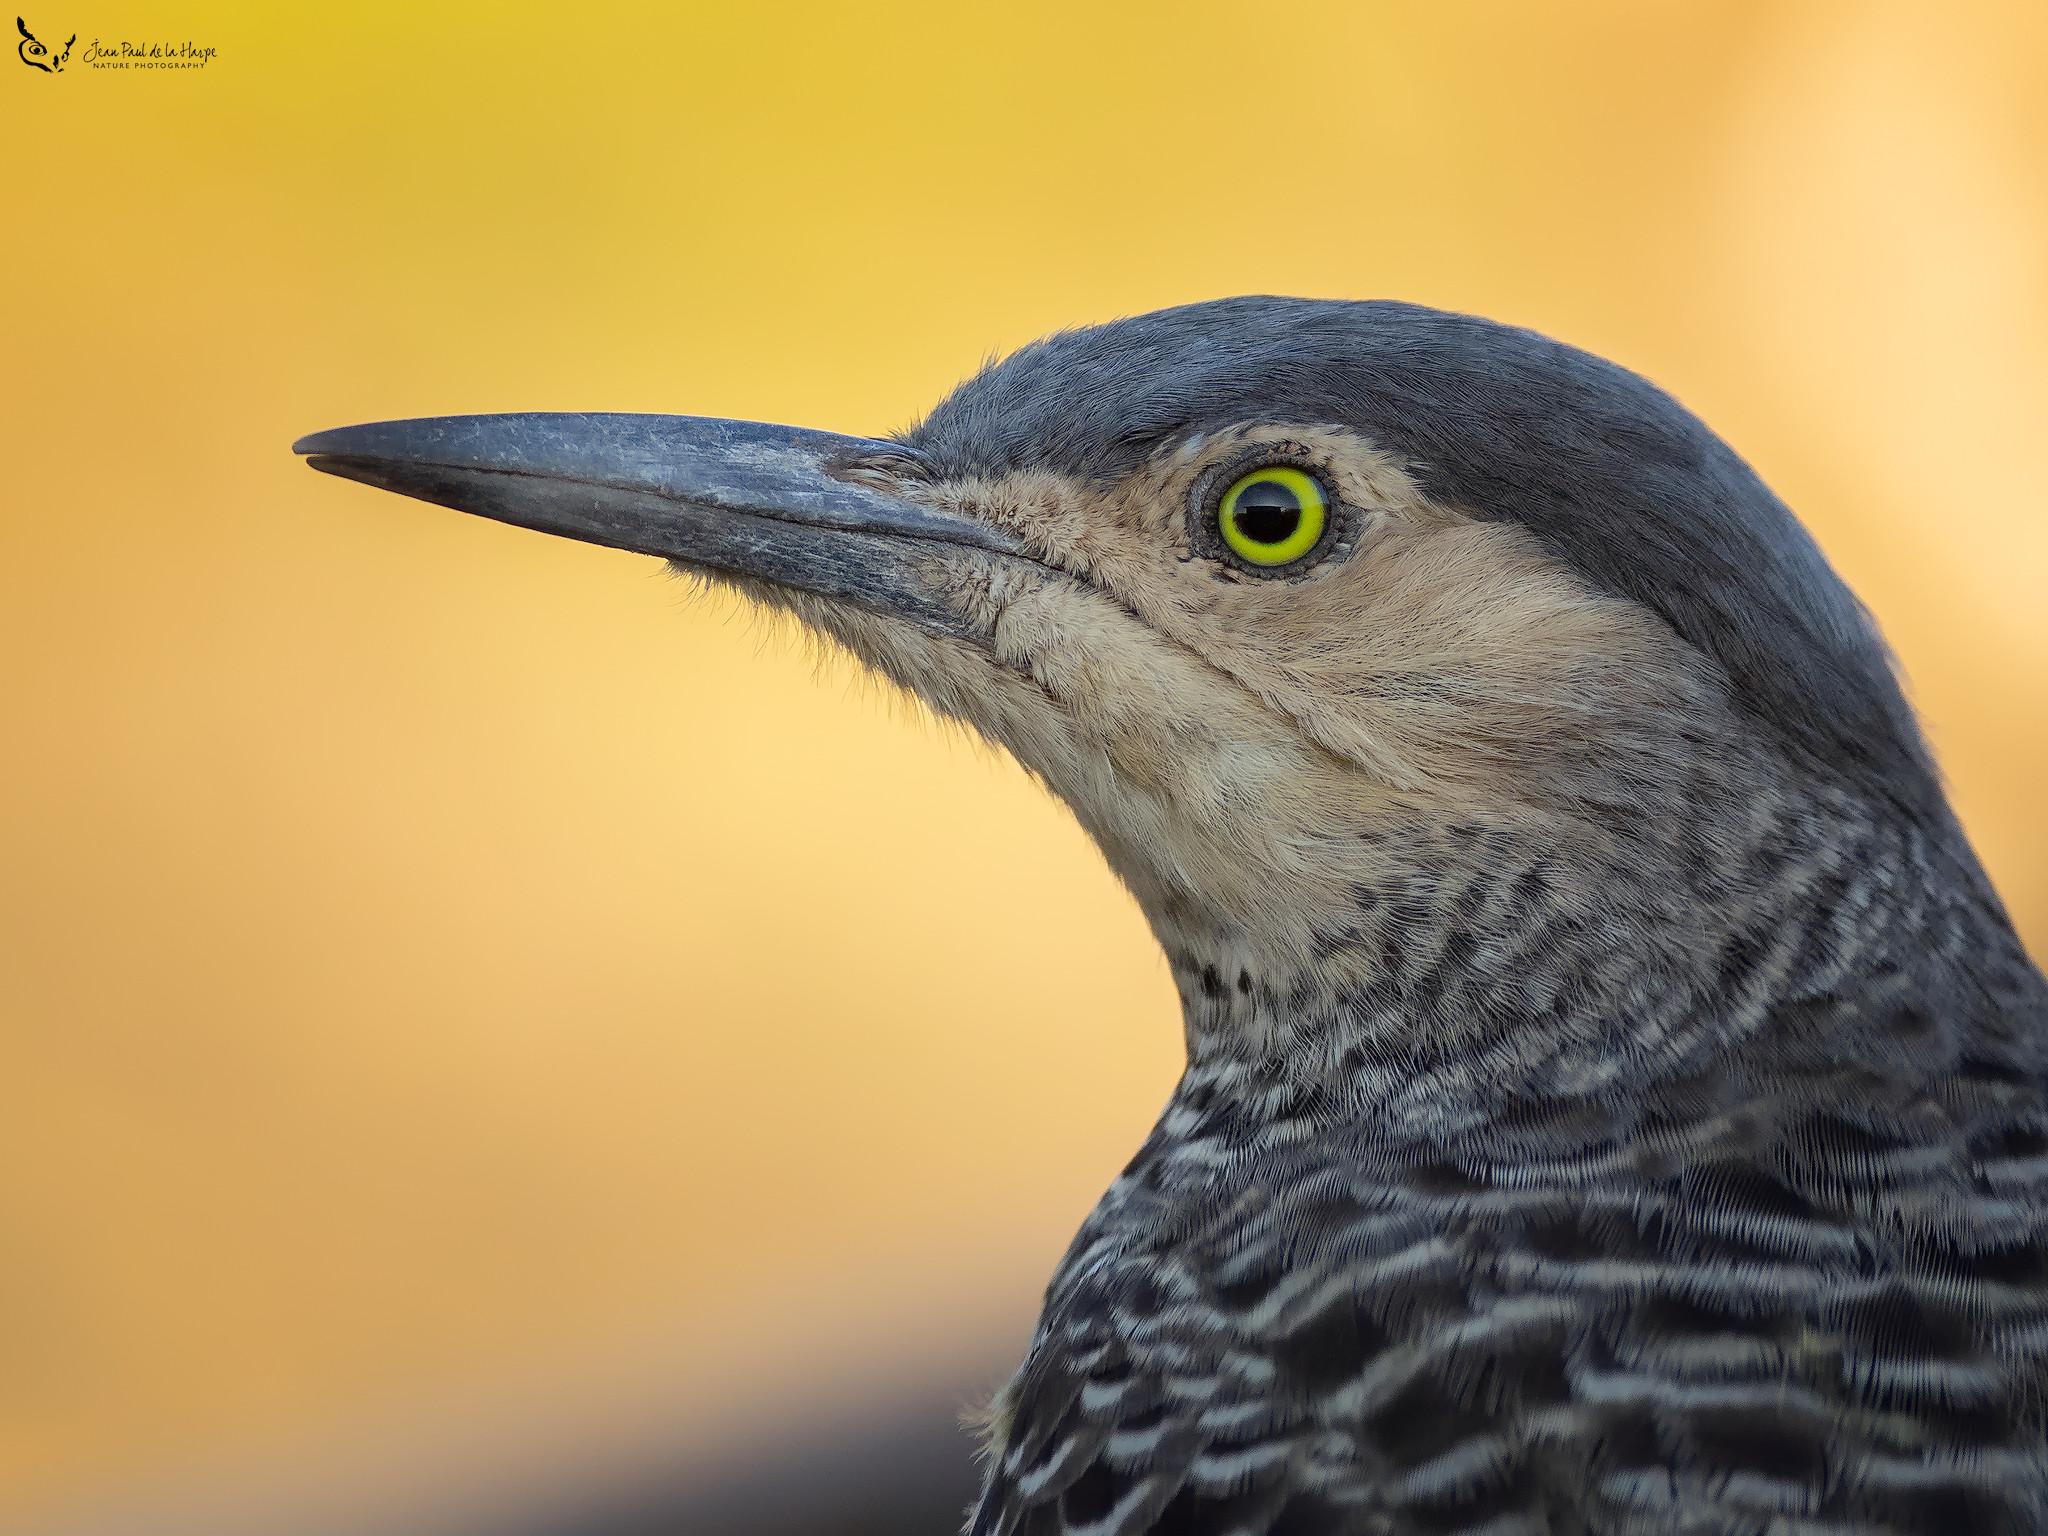 Curso de Fotografía de Aves